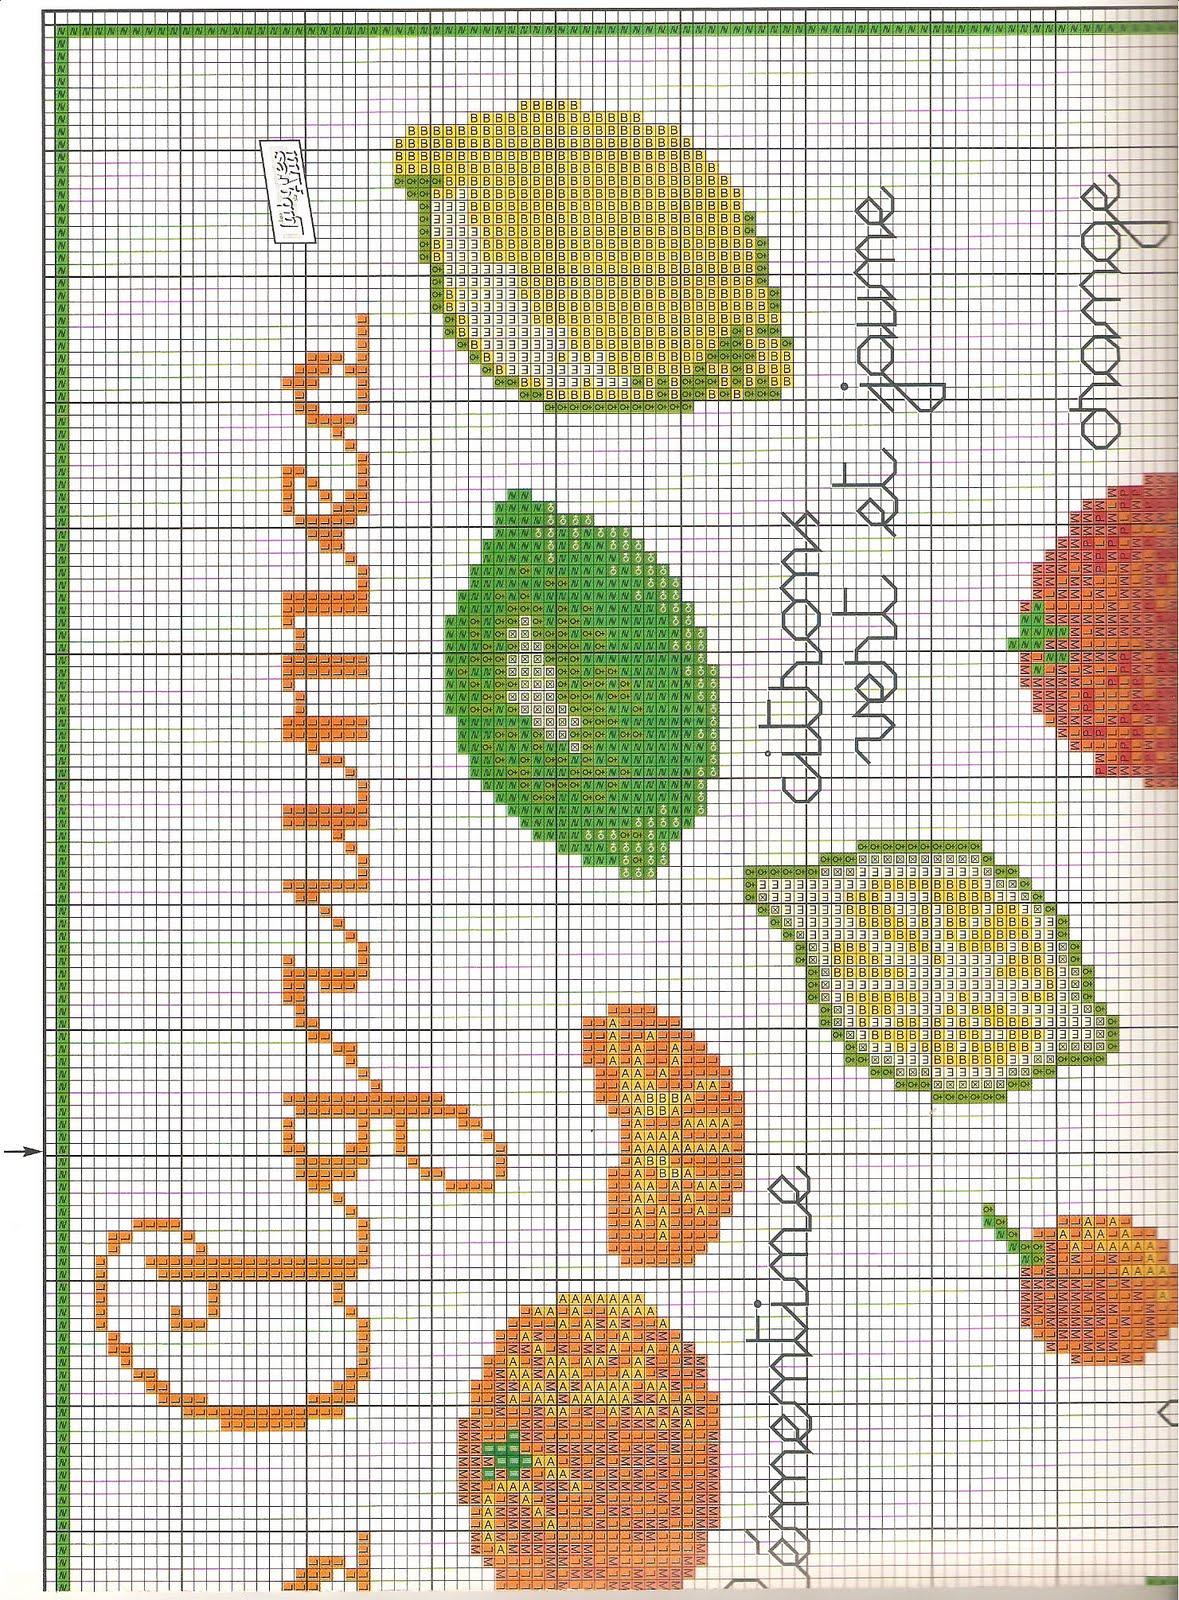 Ricami Punto Croce Per Cucina.Ricamo Schema Punto Croce La Frutta In Cucina 5